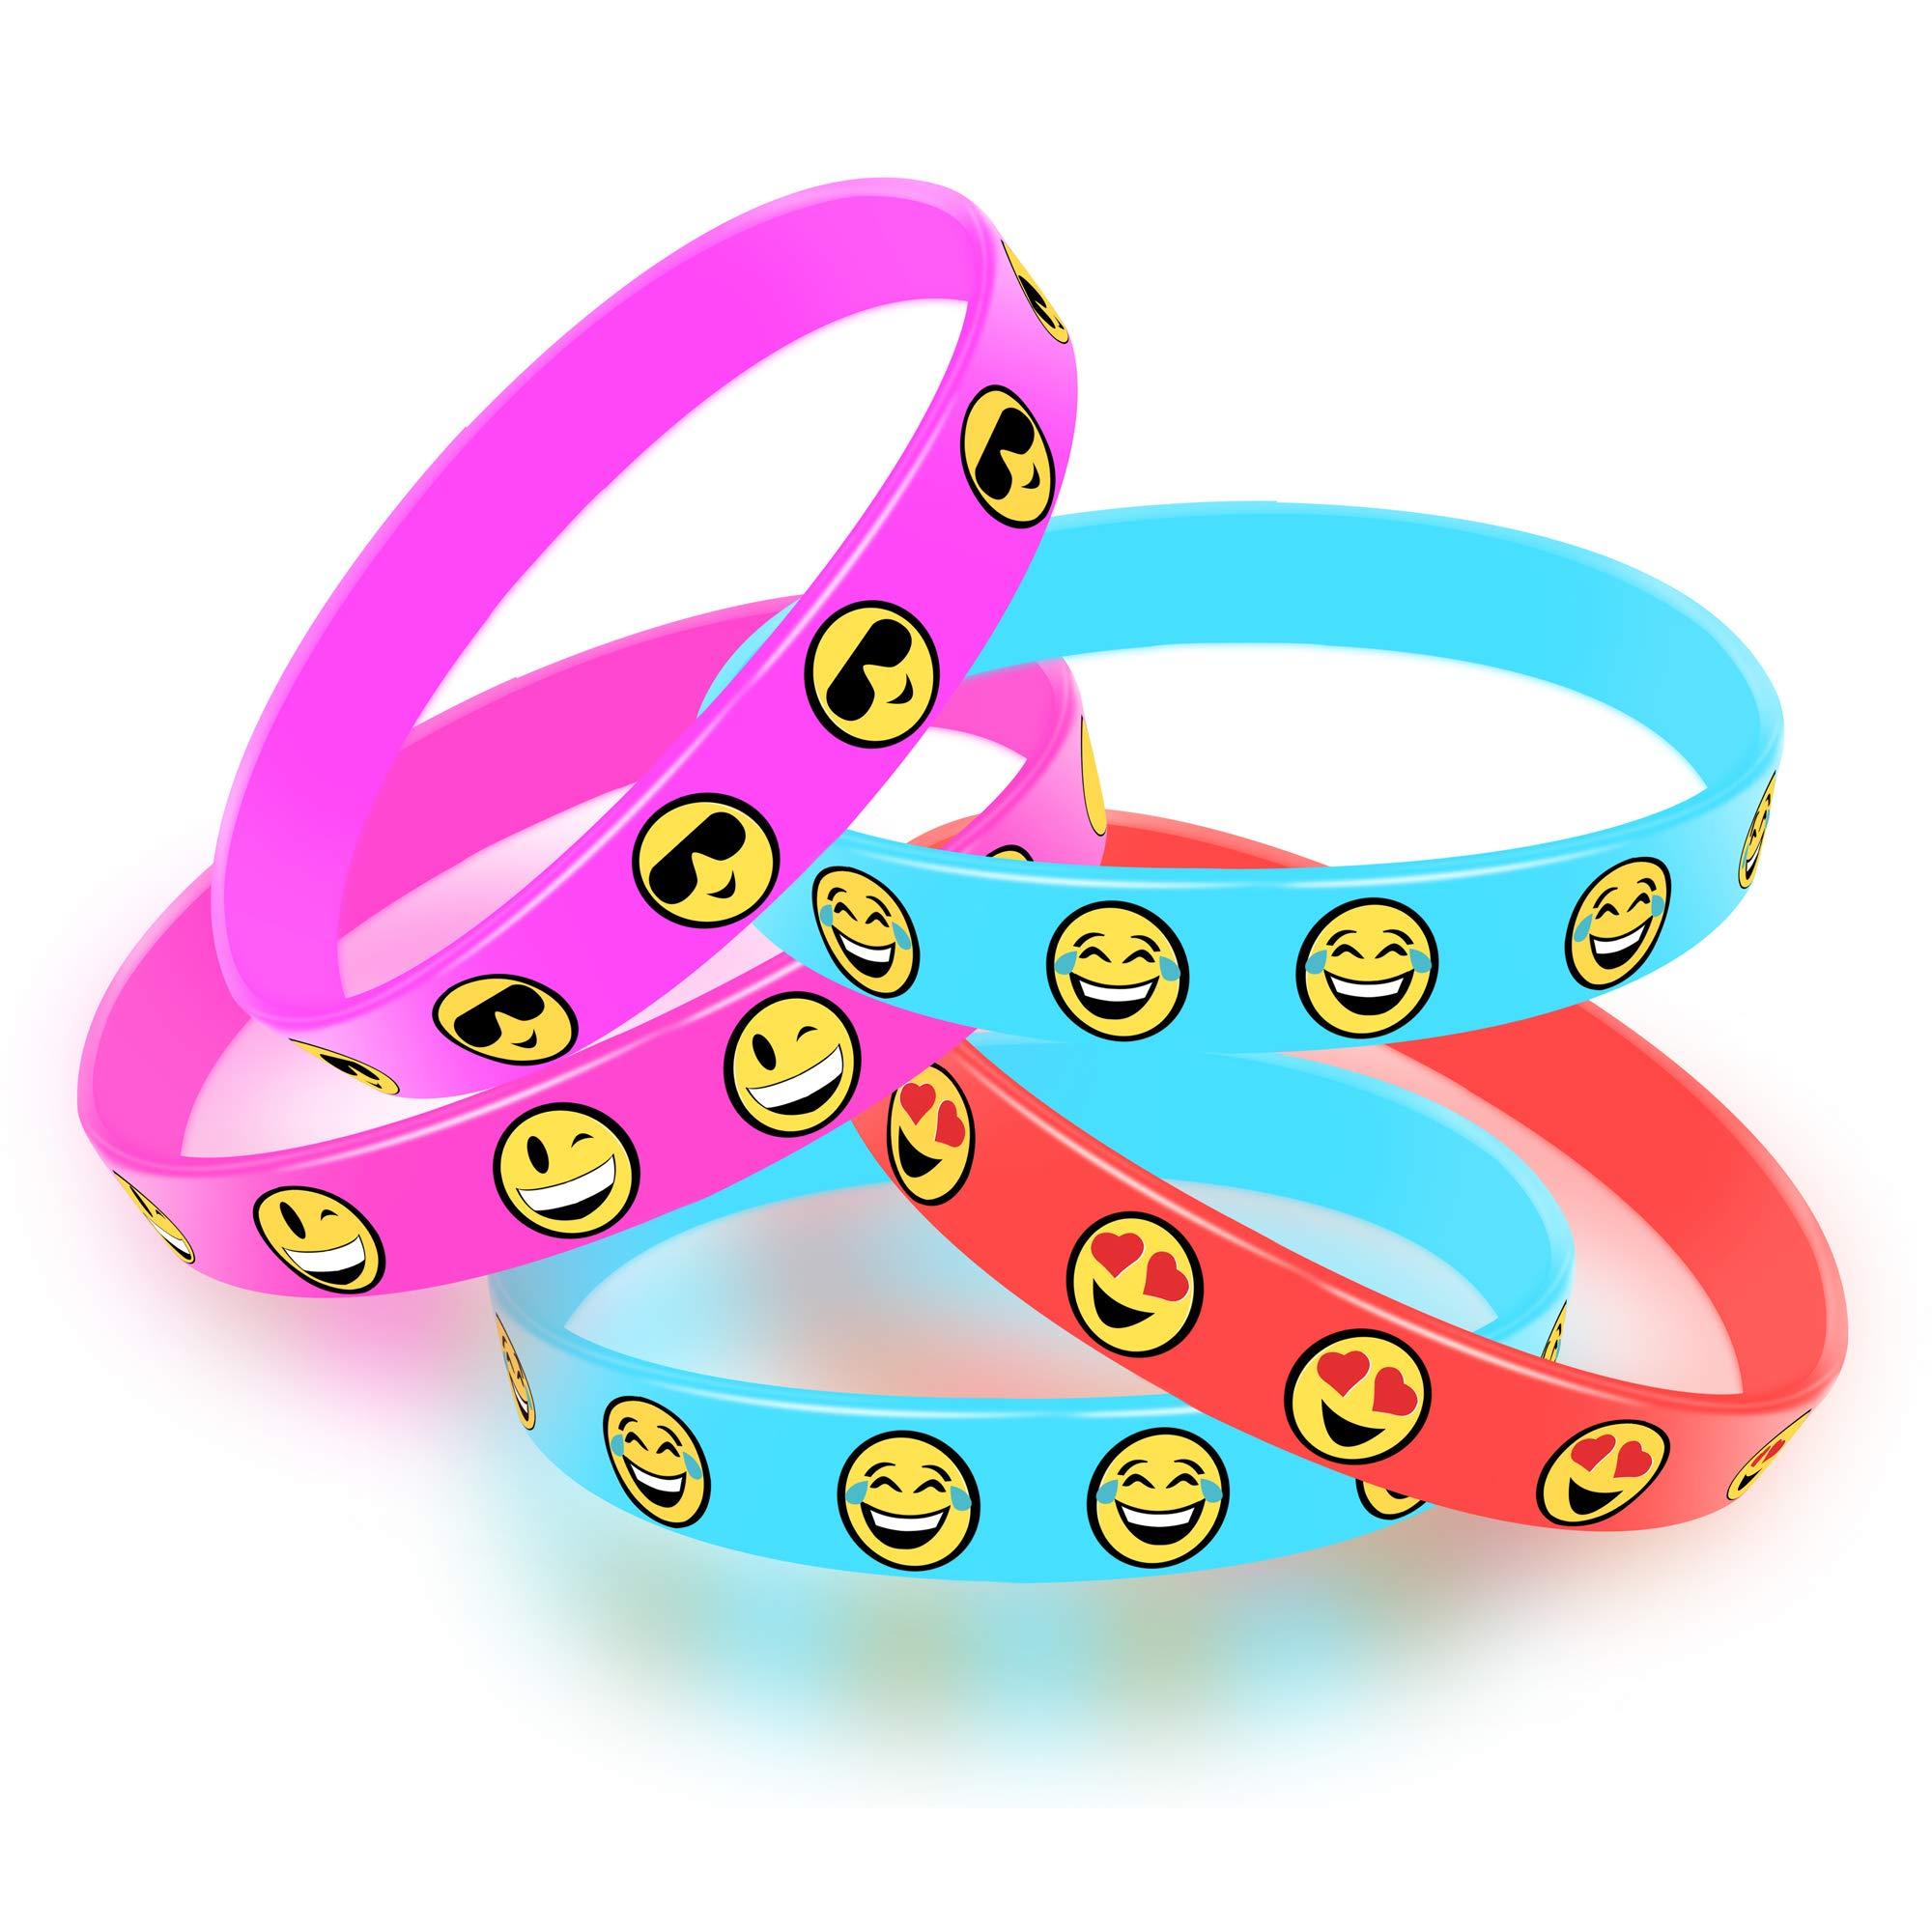 Fun Central 36 Pack - Emoji Silicone Bracelets Bulk - Emoji Party Supplies for Kids - Assorted